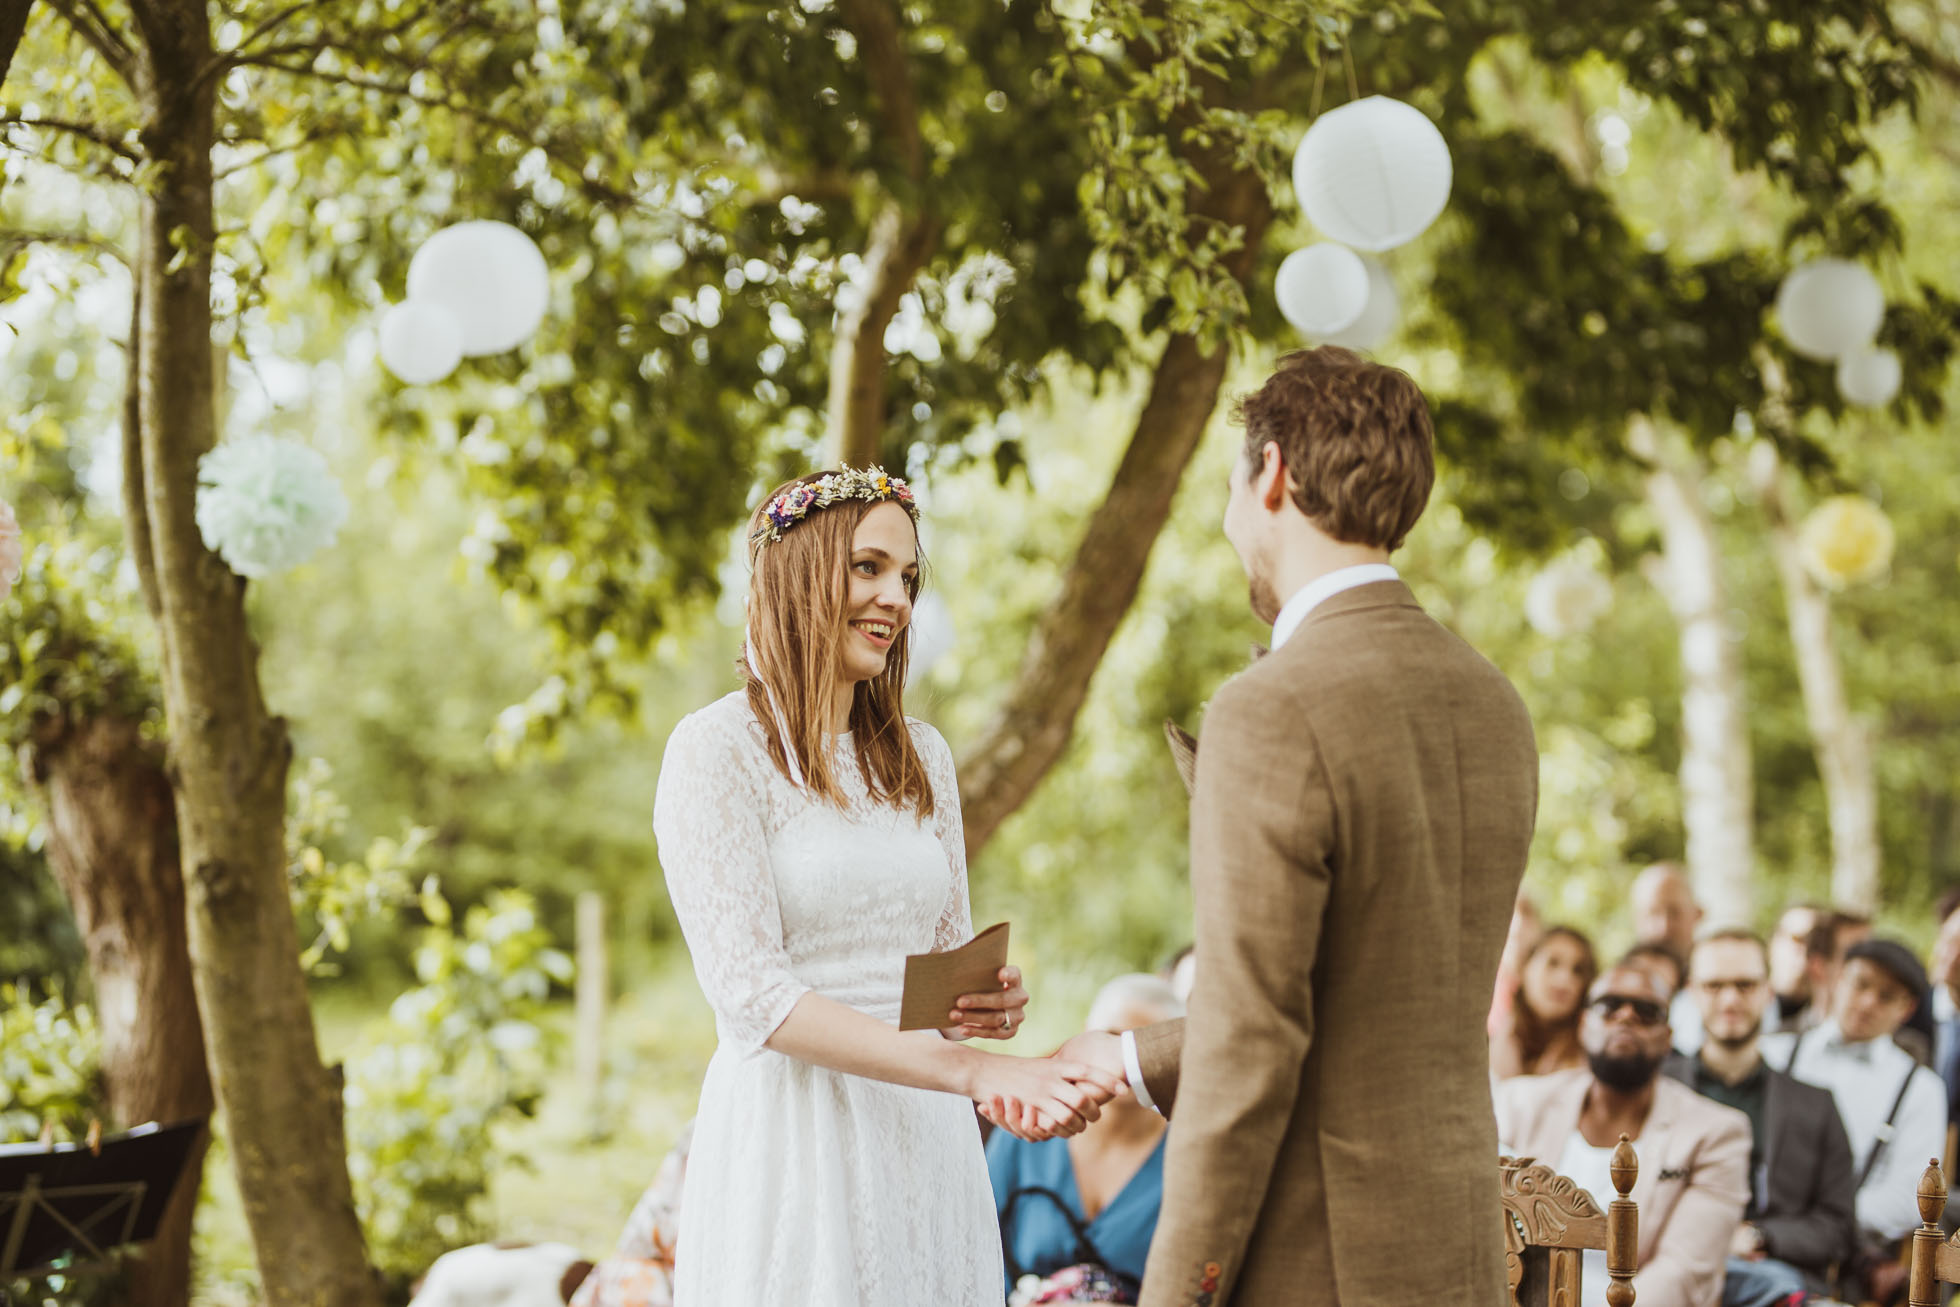 utrecht-wedding-photographer-69.jpg